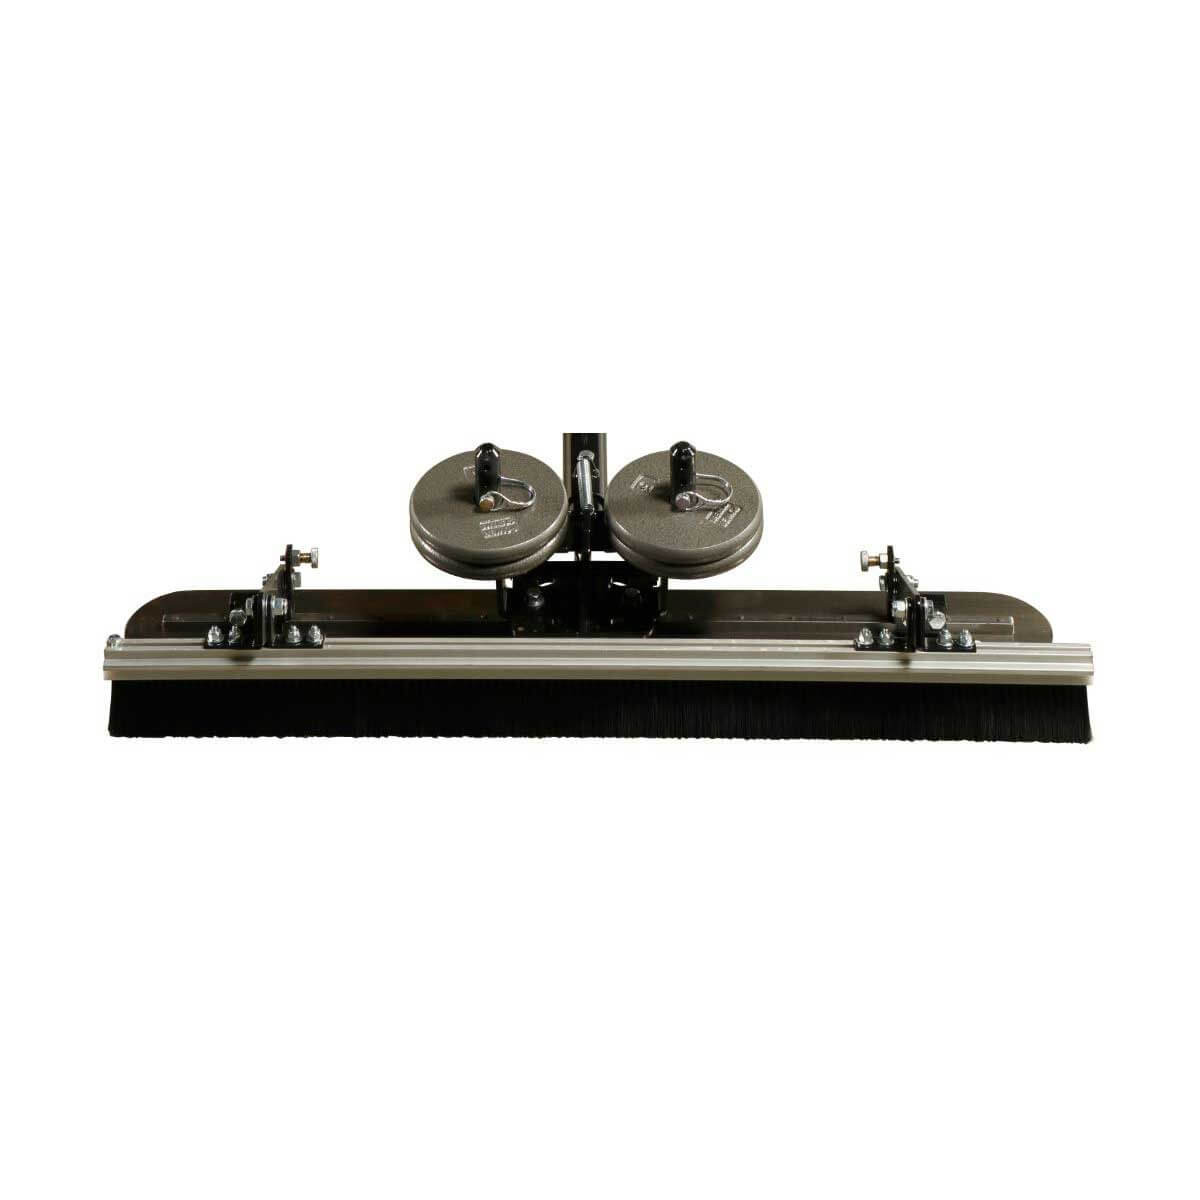 Multiquip Whiteman handle controls